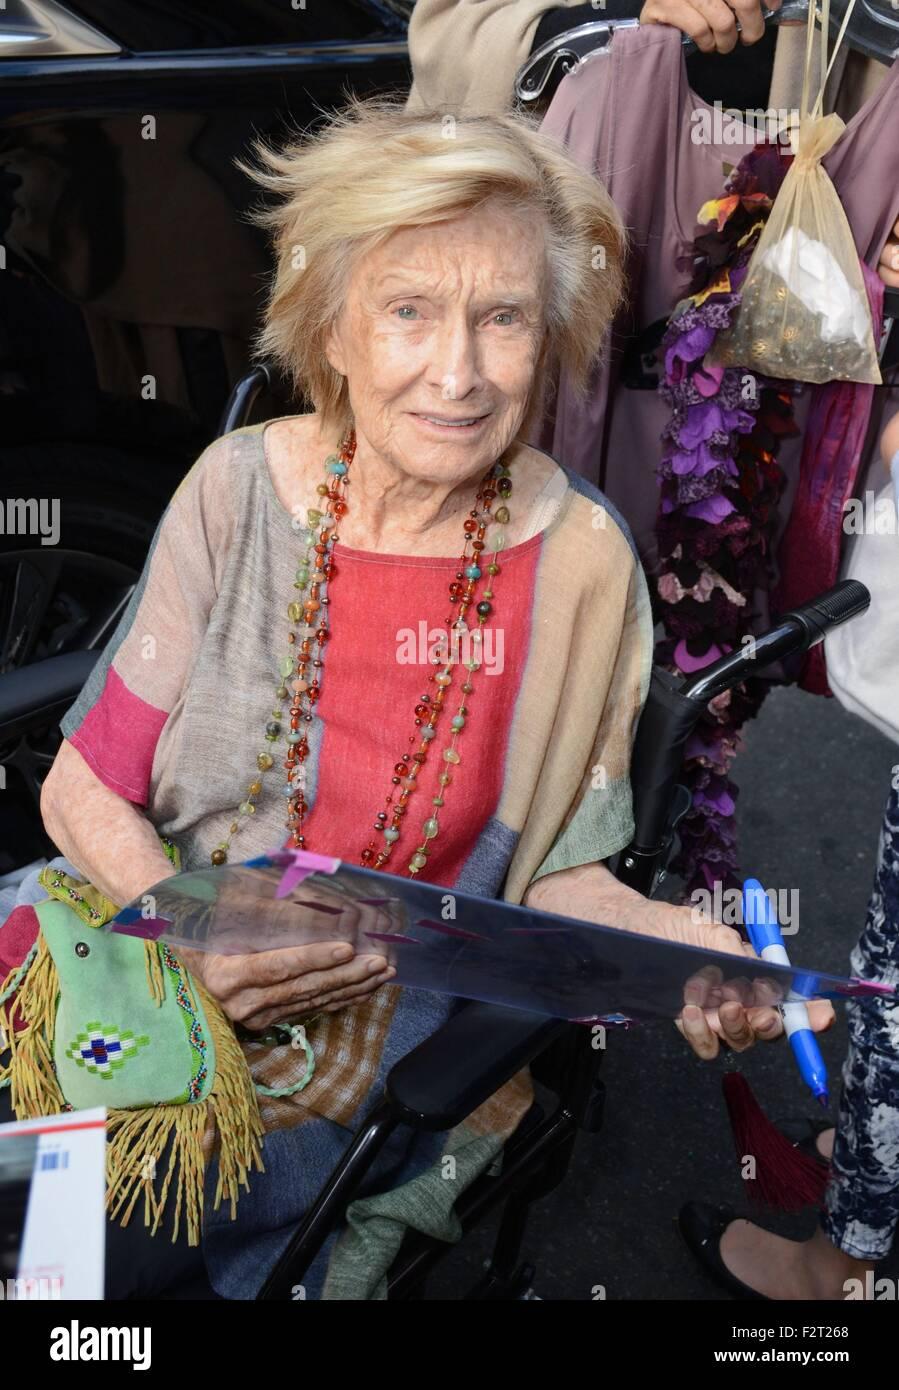 New York NY USA 23rd Sep 2015 Cloris Leachman at the